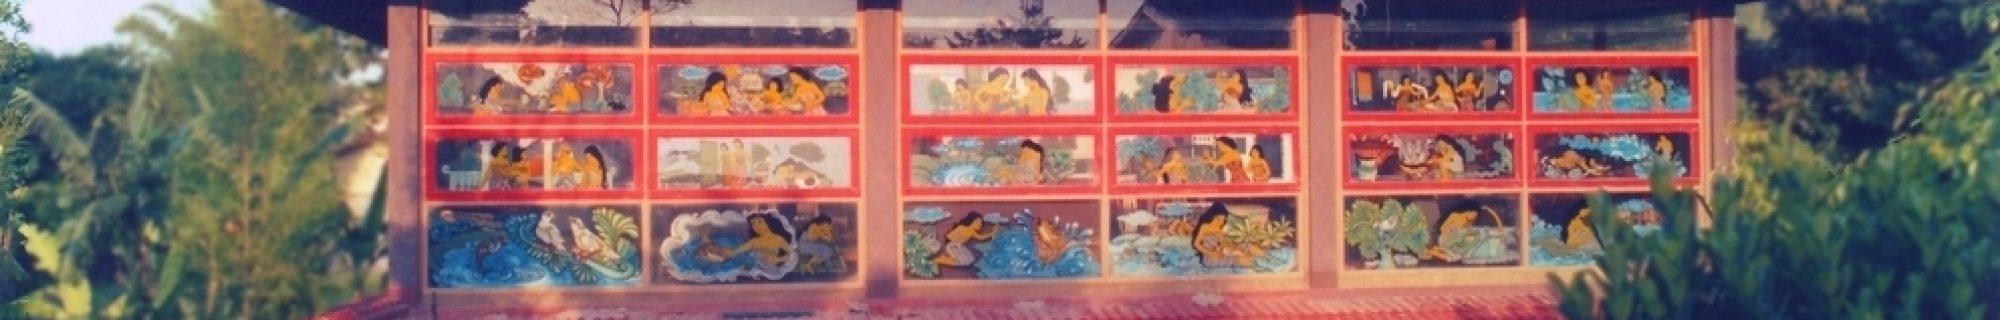 Kabar Balai Budaya Minomartani